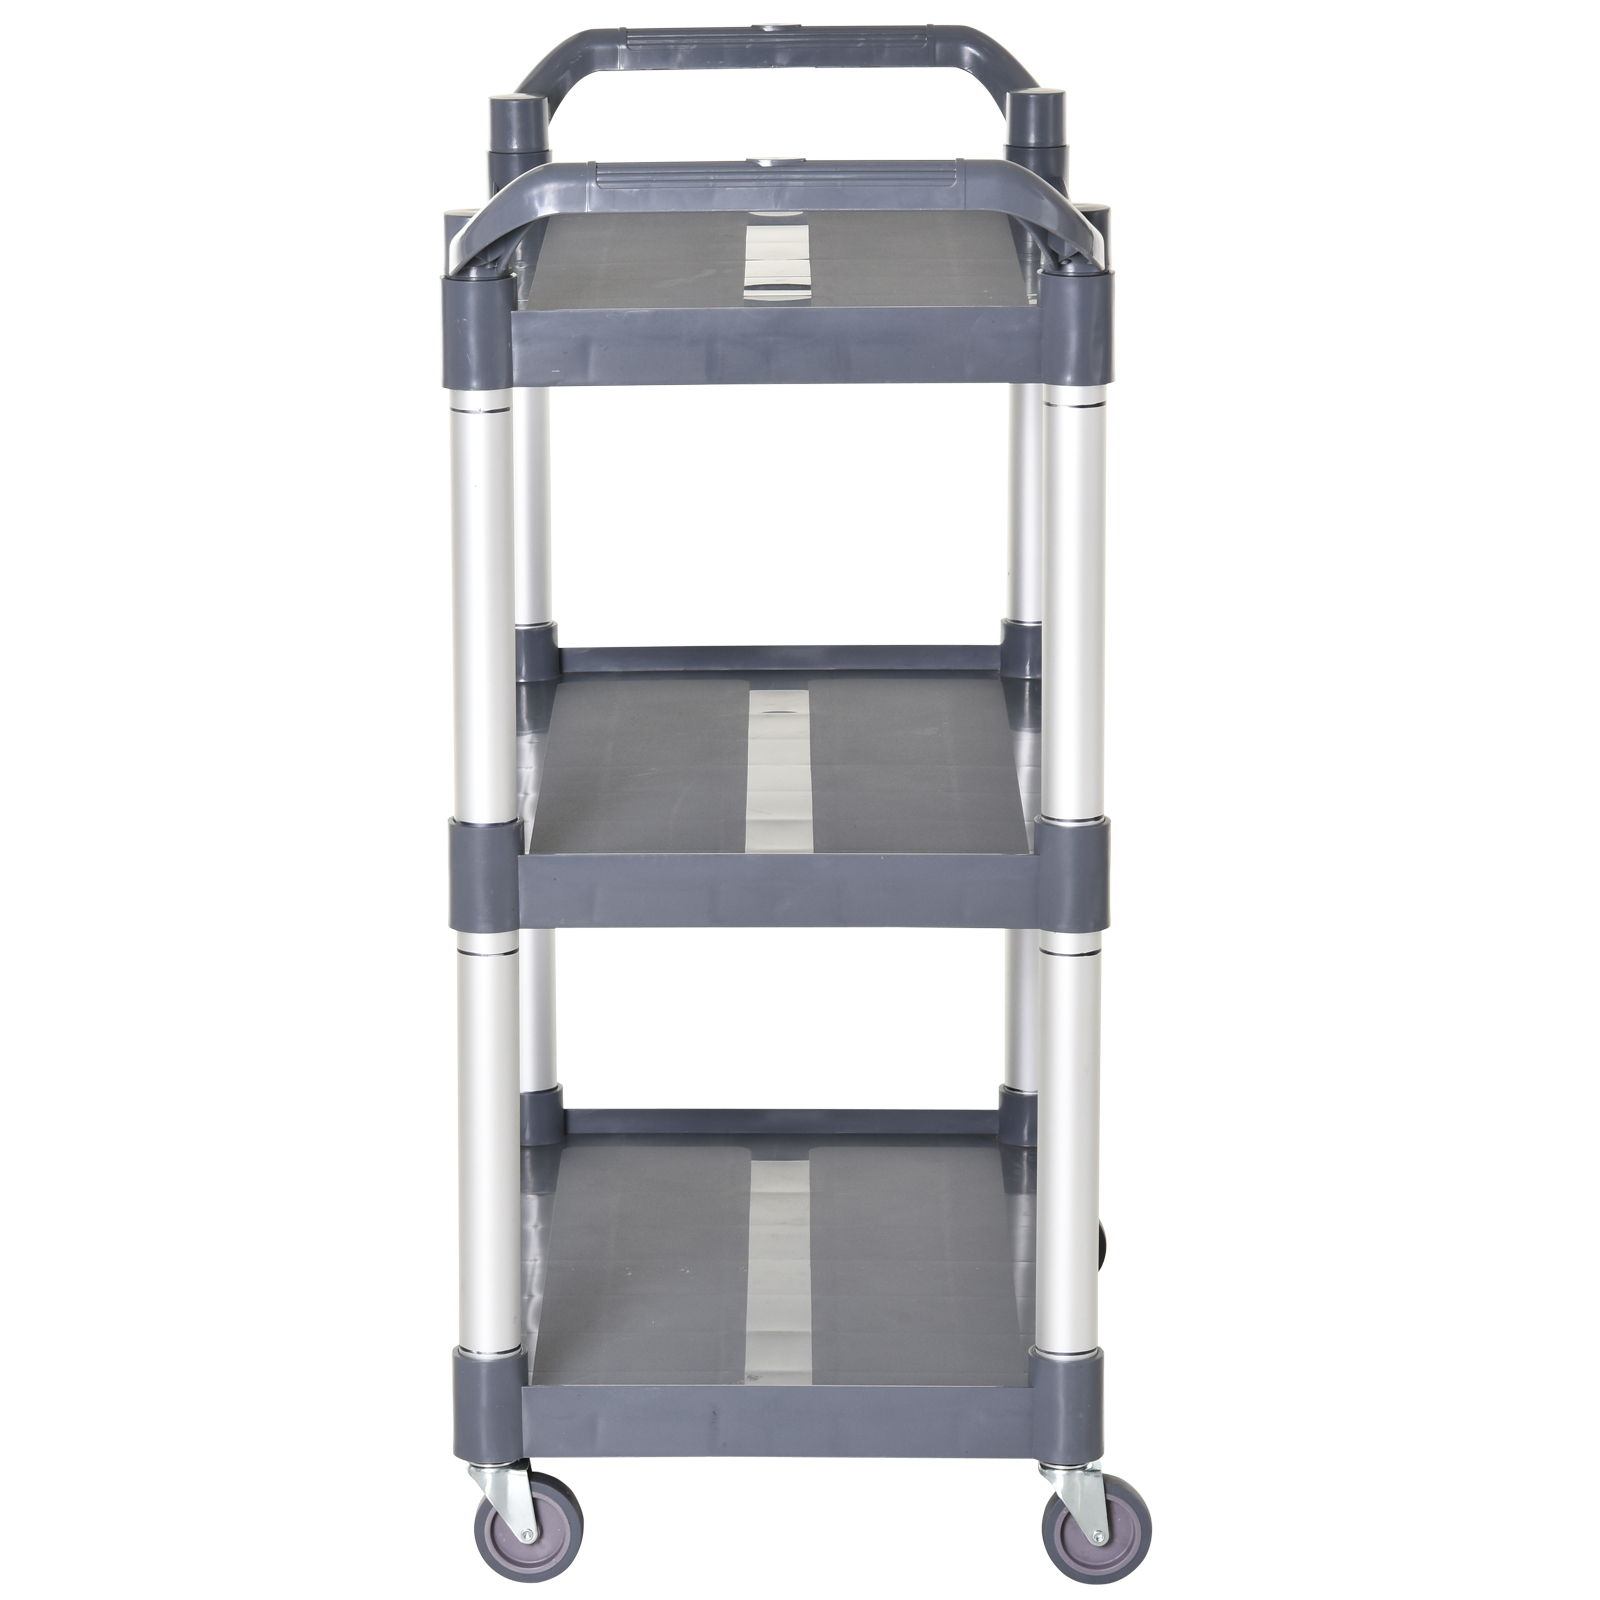 HOMCOM-3-Tier-Metal-Trolley-Serving-Cart-Free-Moving-Kitchen-Livingroom thumbnail 7